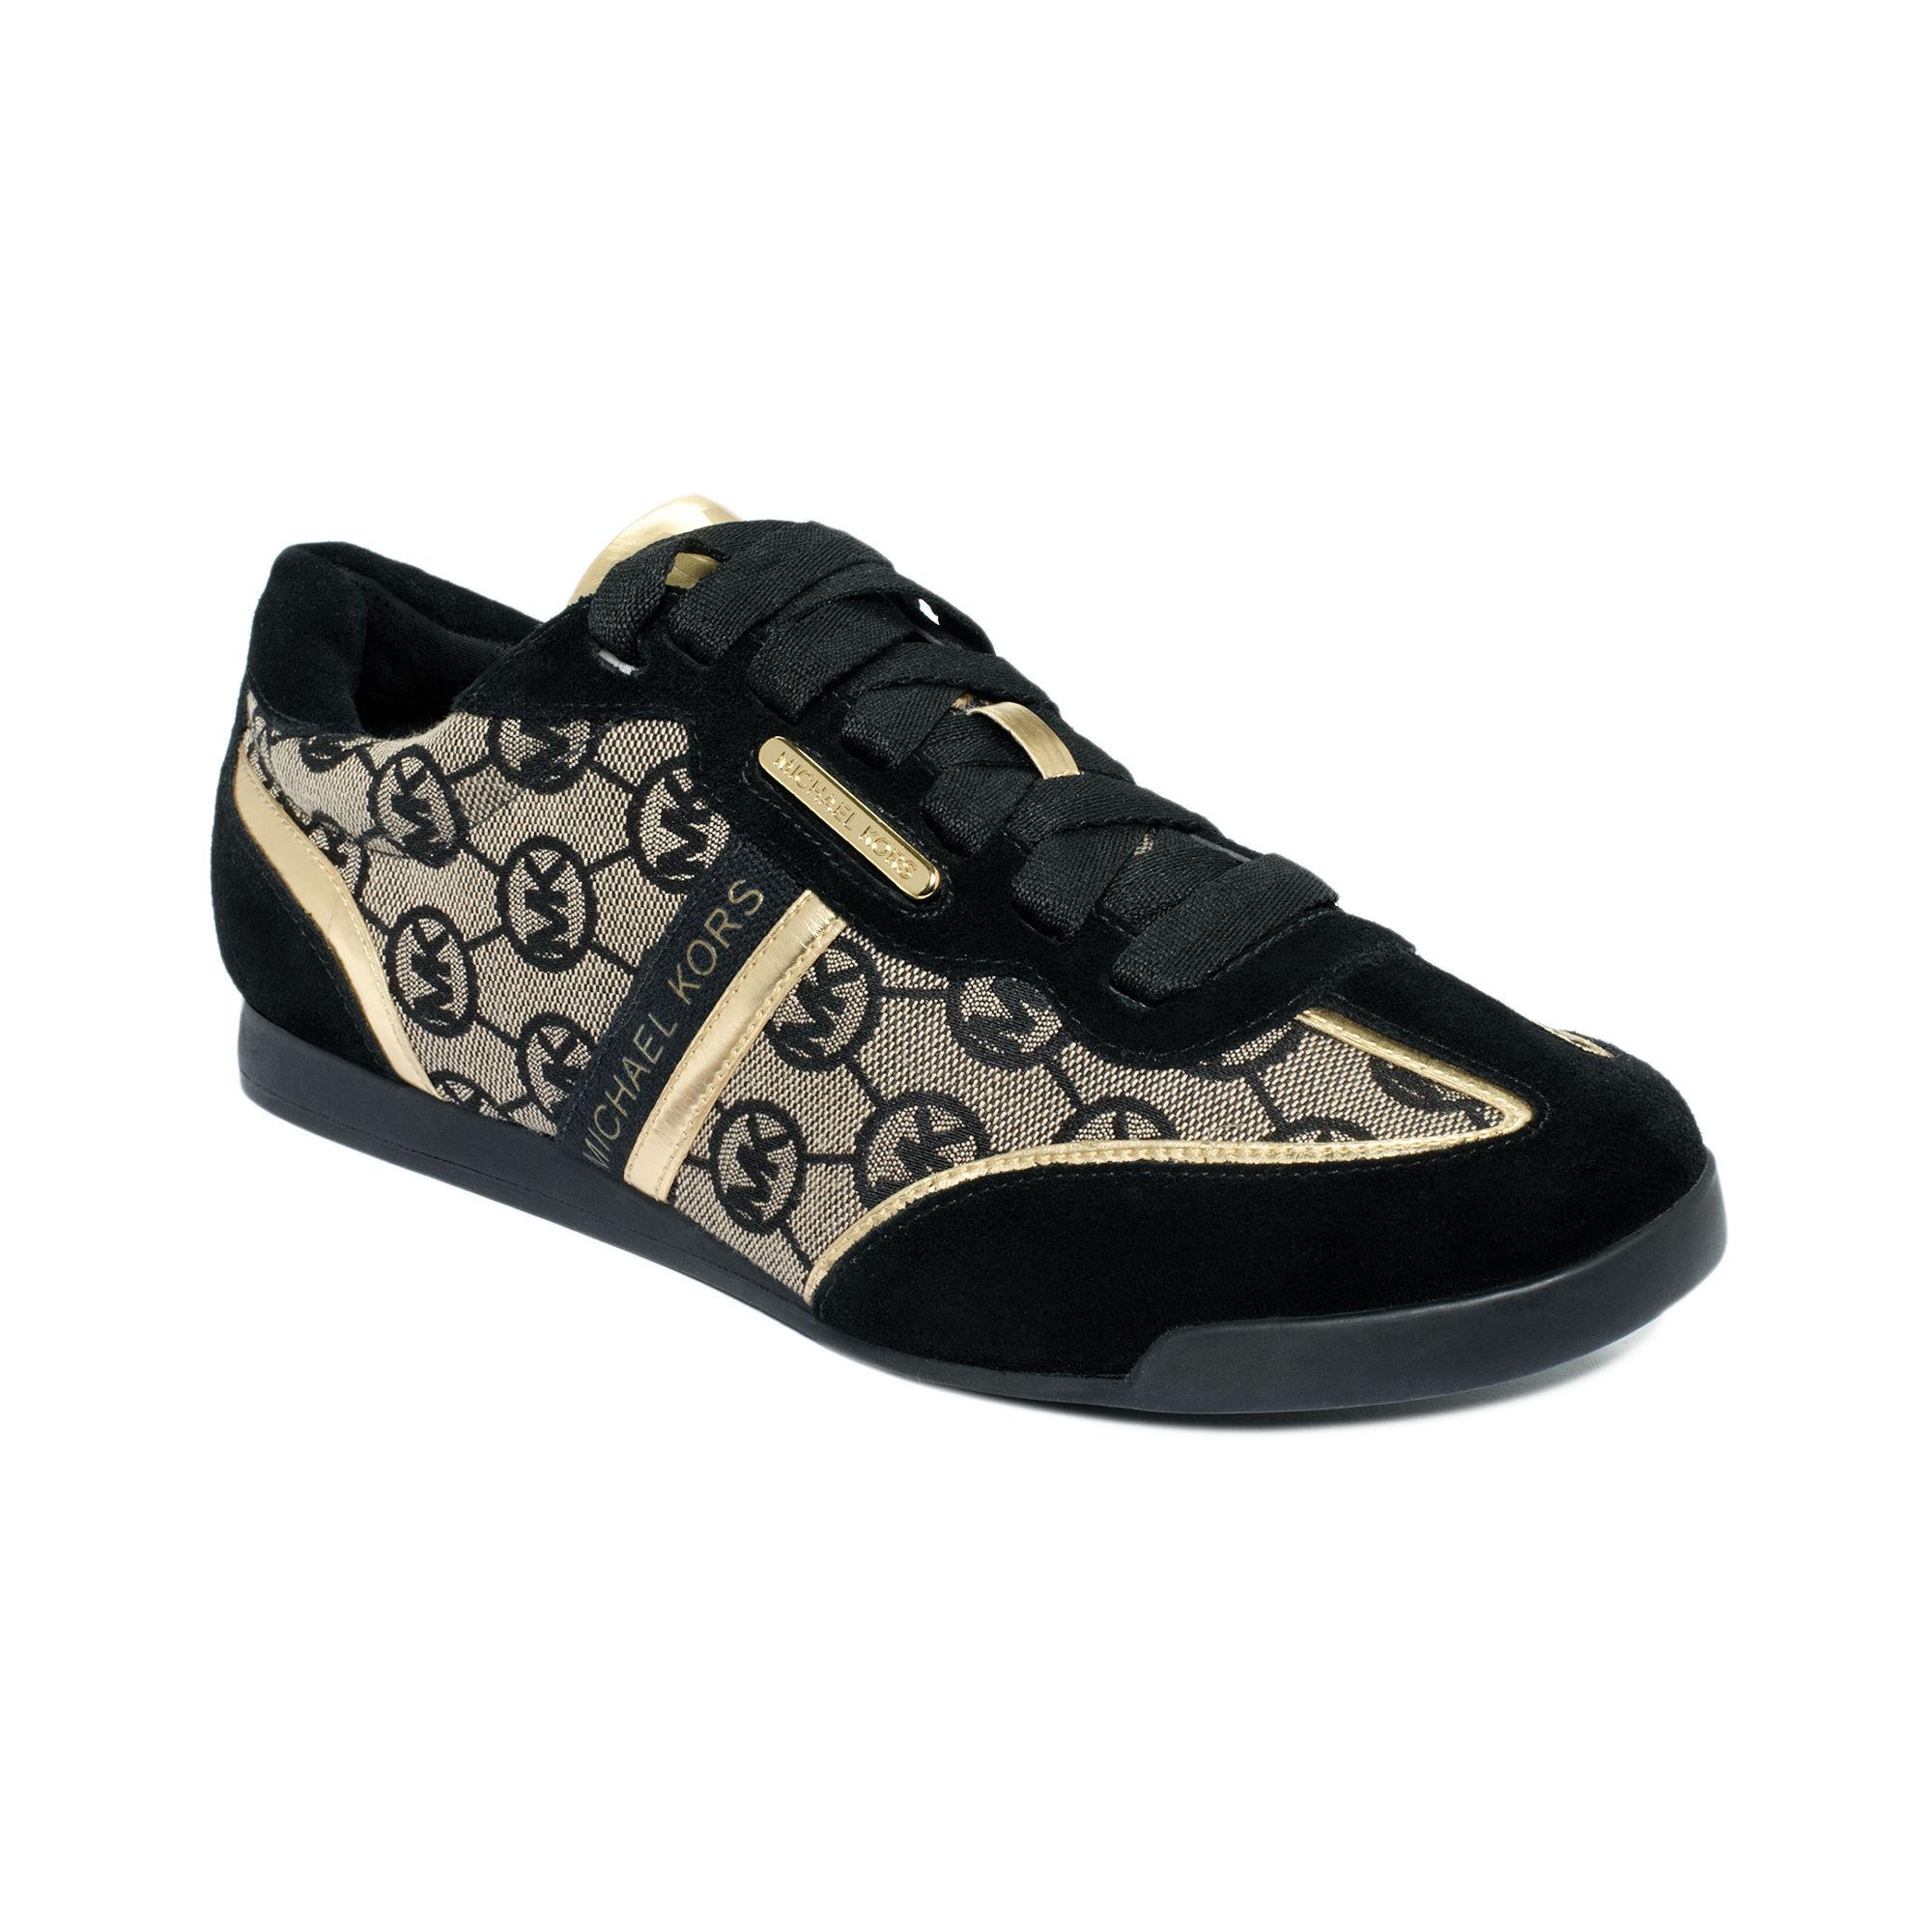 lyst michael kors mk trainer sneakers in brown. Black Bedroom Furniture Sets. Home Design Ideas